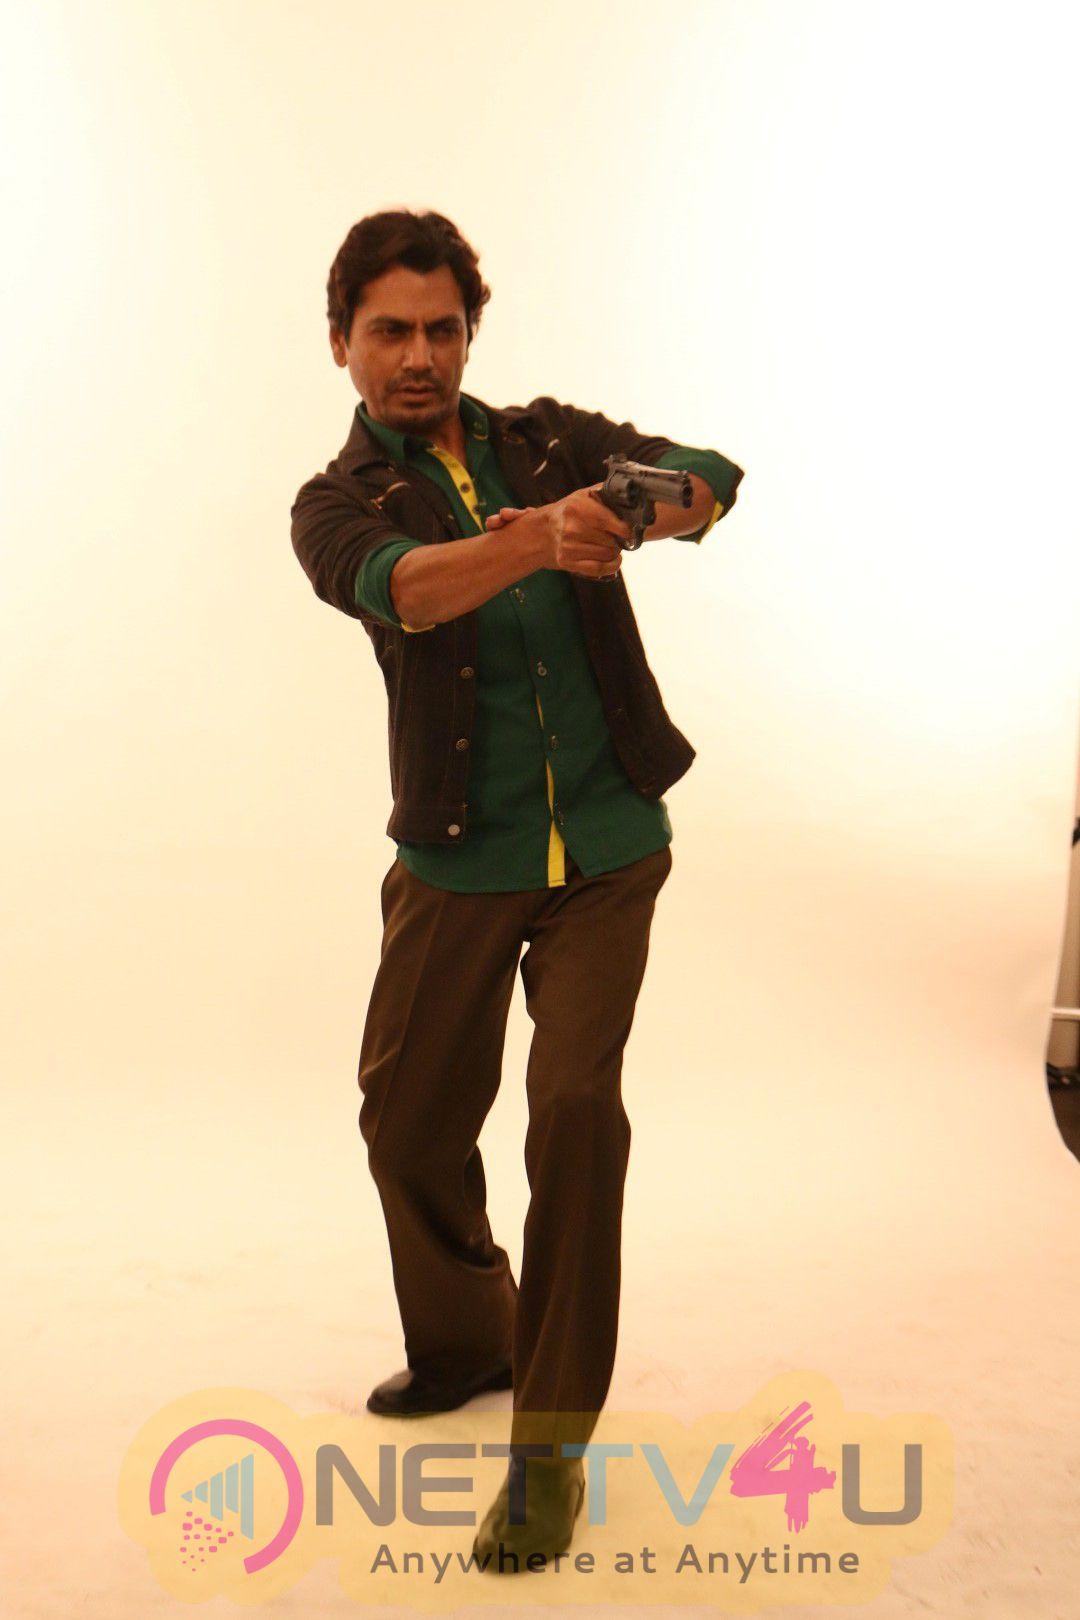 Shooting For His First Movie Poster Of His Upcoming Film Babumoshai Bandookbaaz Stills